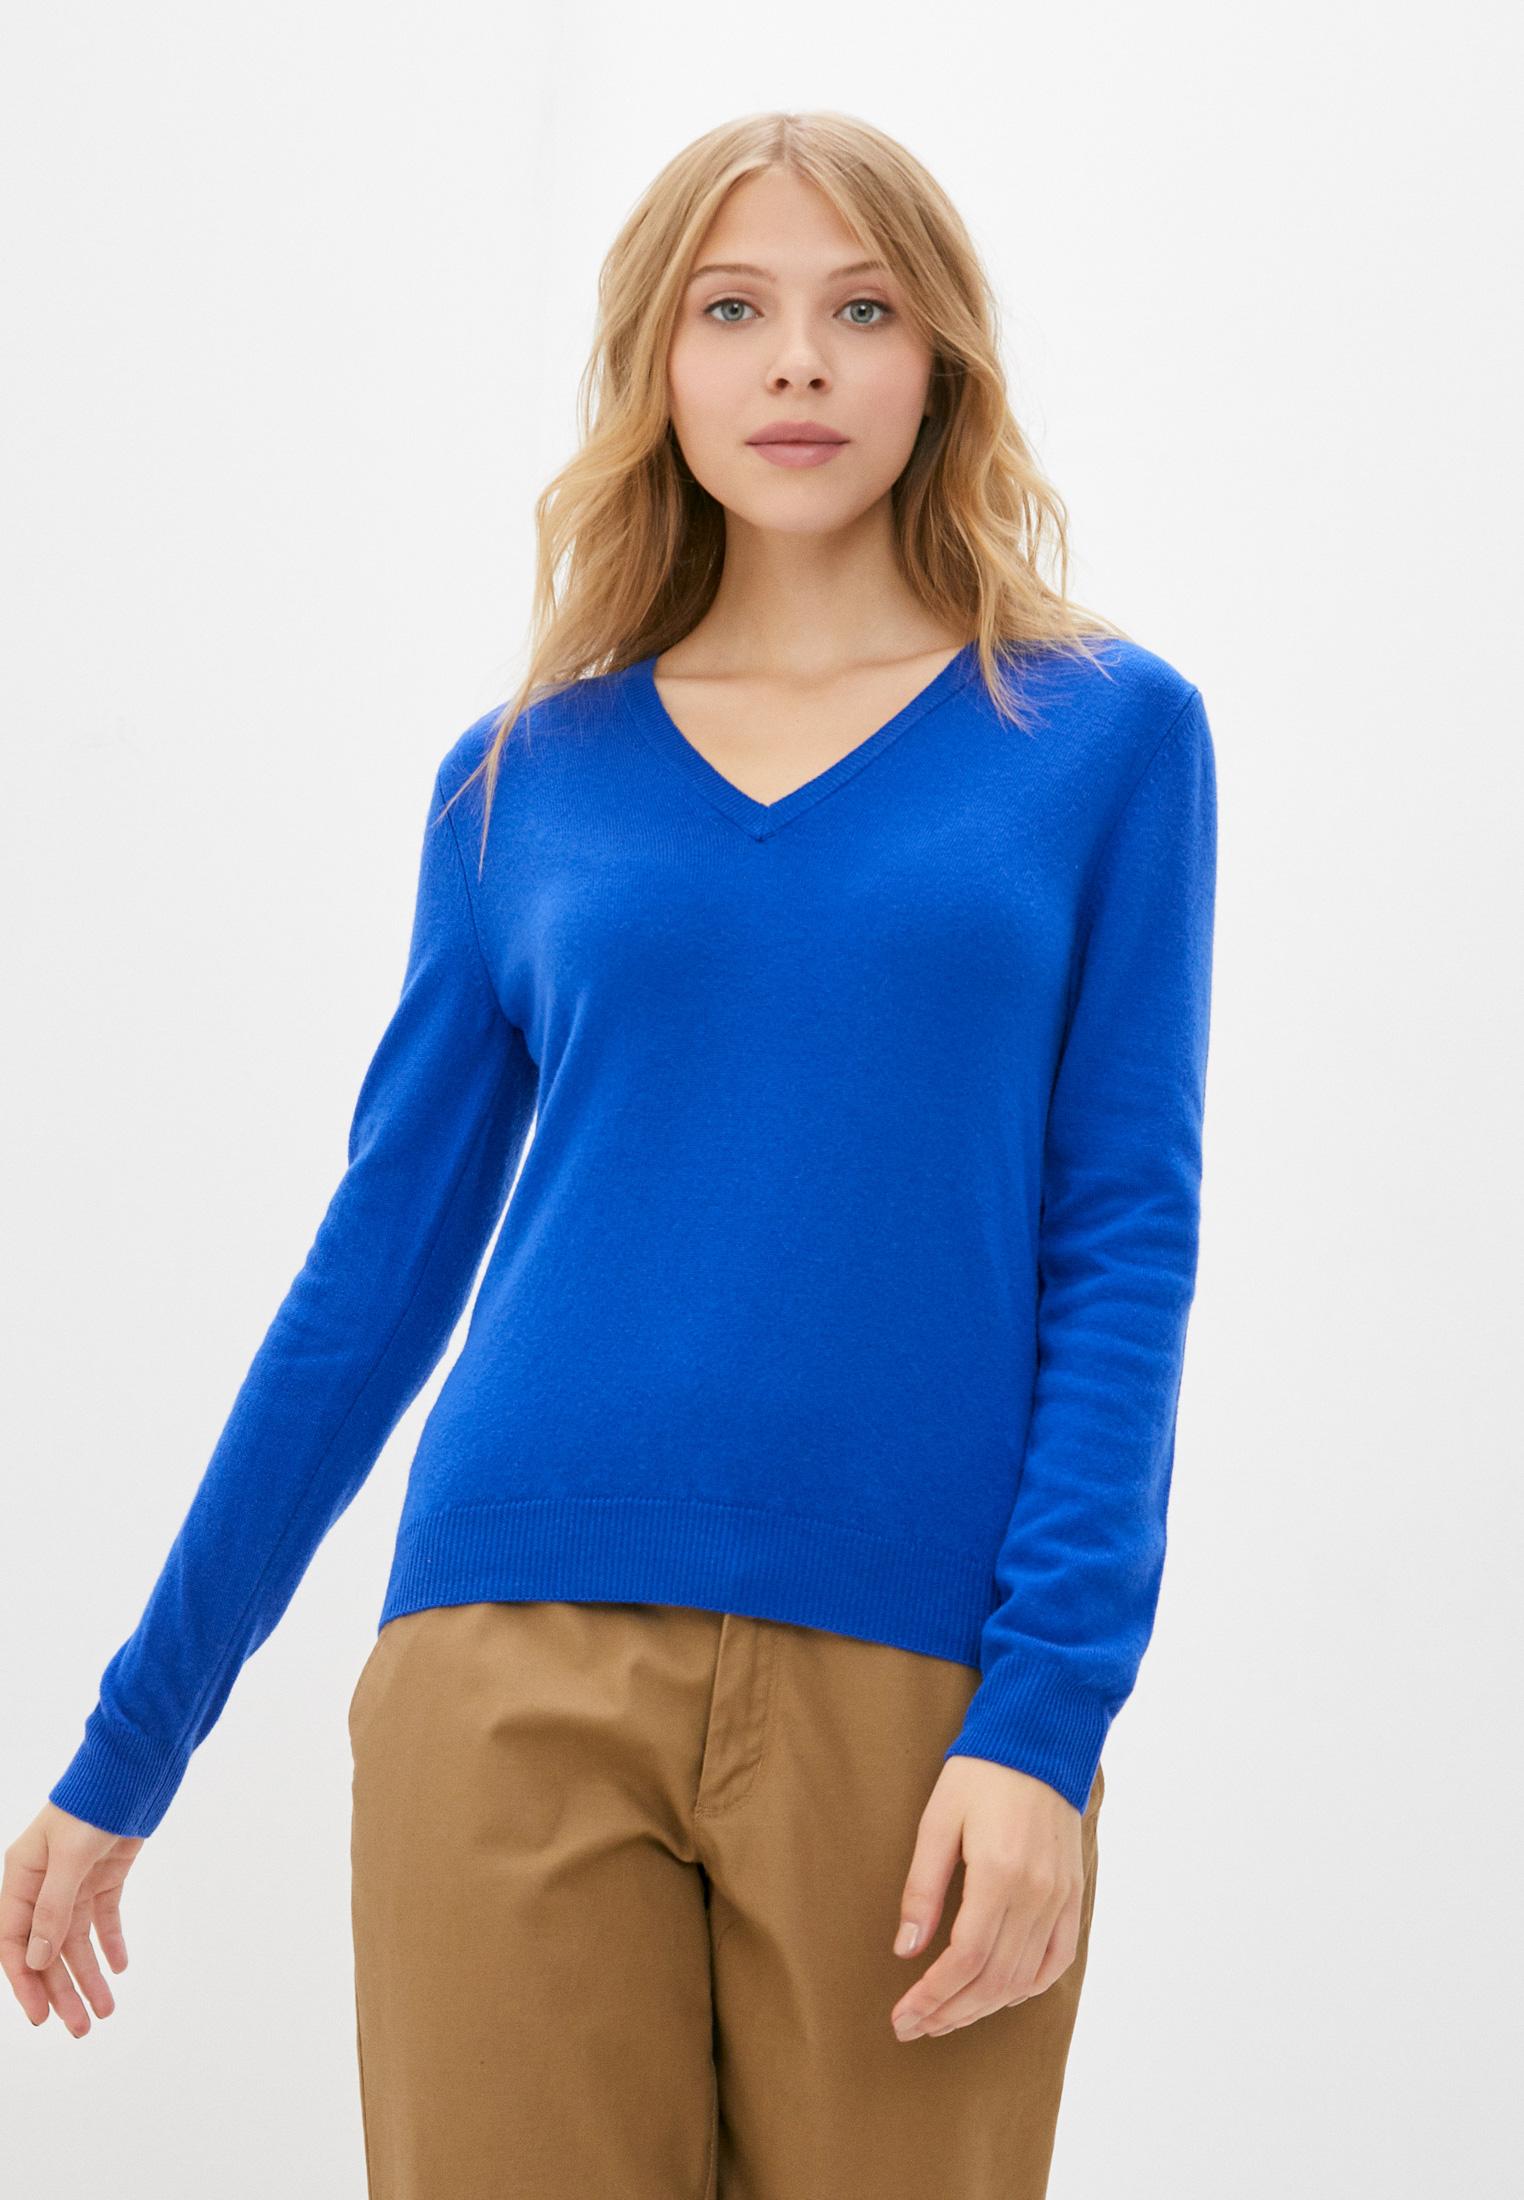 Пуловер United Colors of Benetton (Юнайтед Колорс оф Бенеттон) 1002D4488: изображение 4